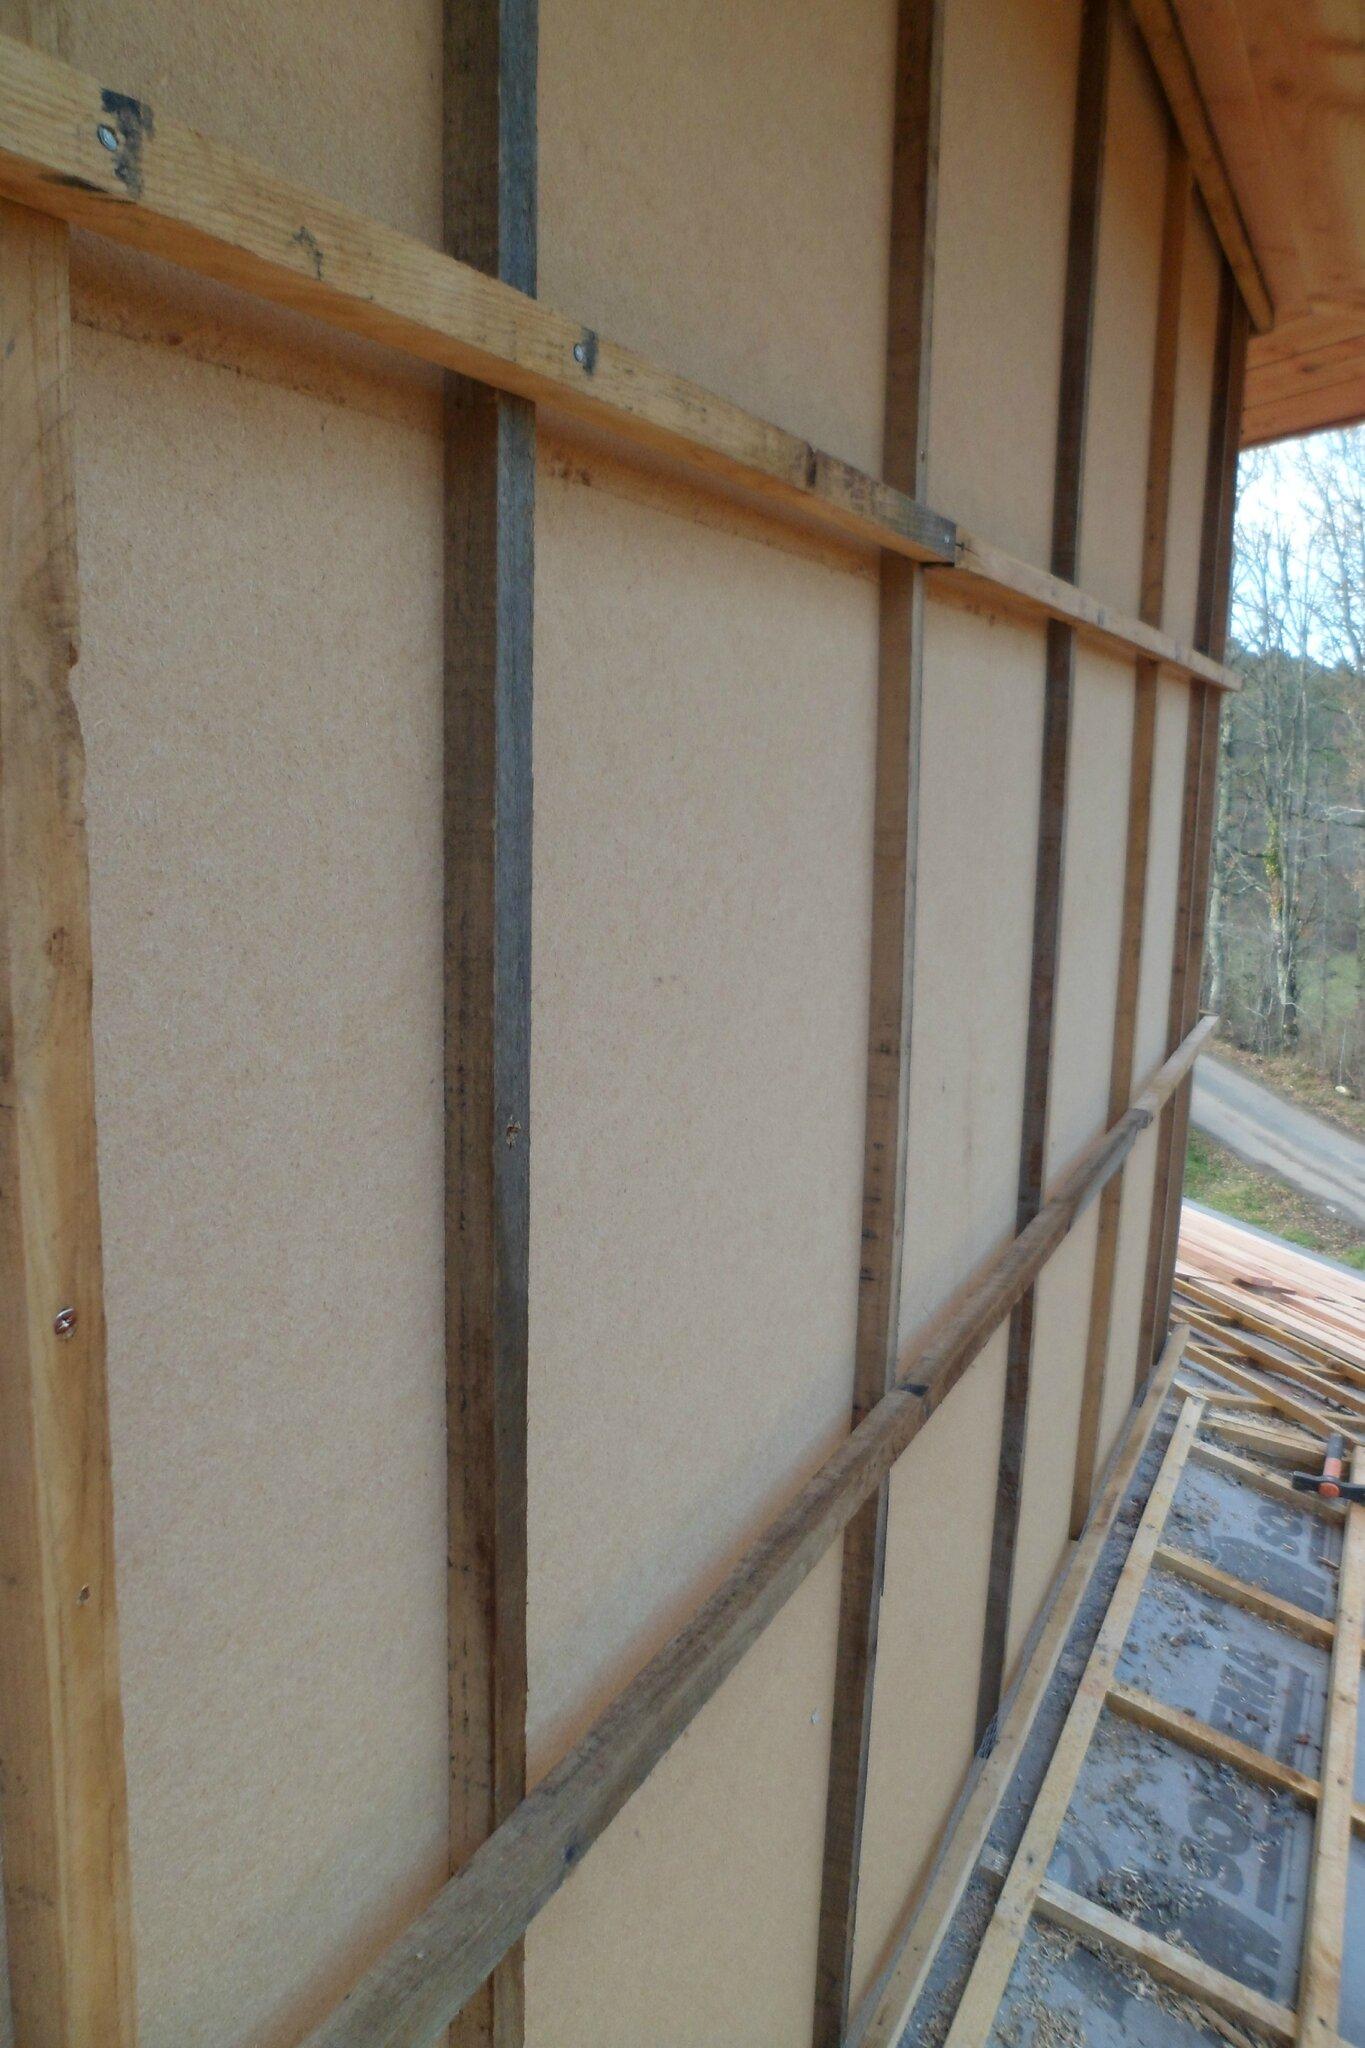 Bardage bois octodomus notre maison octopassive - Fixation bardage bois exterieur ...